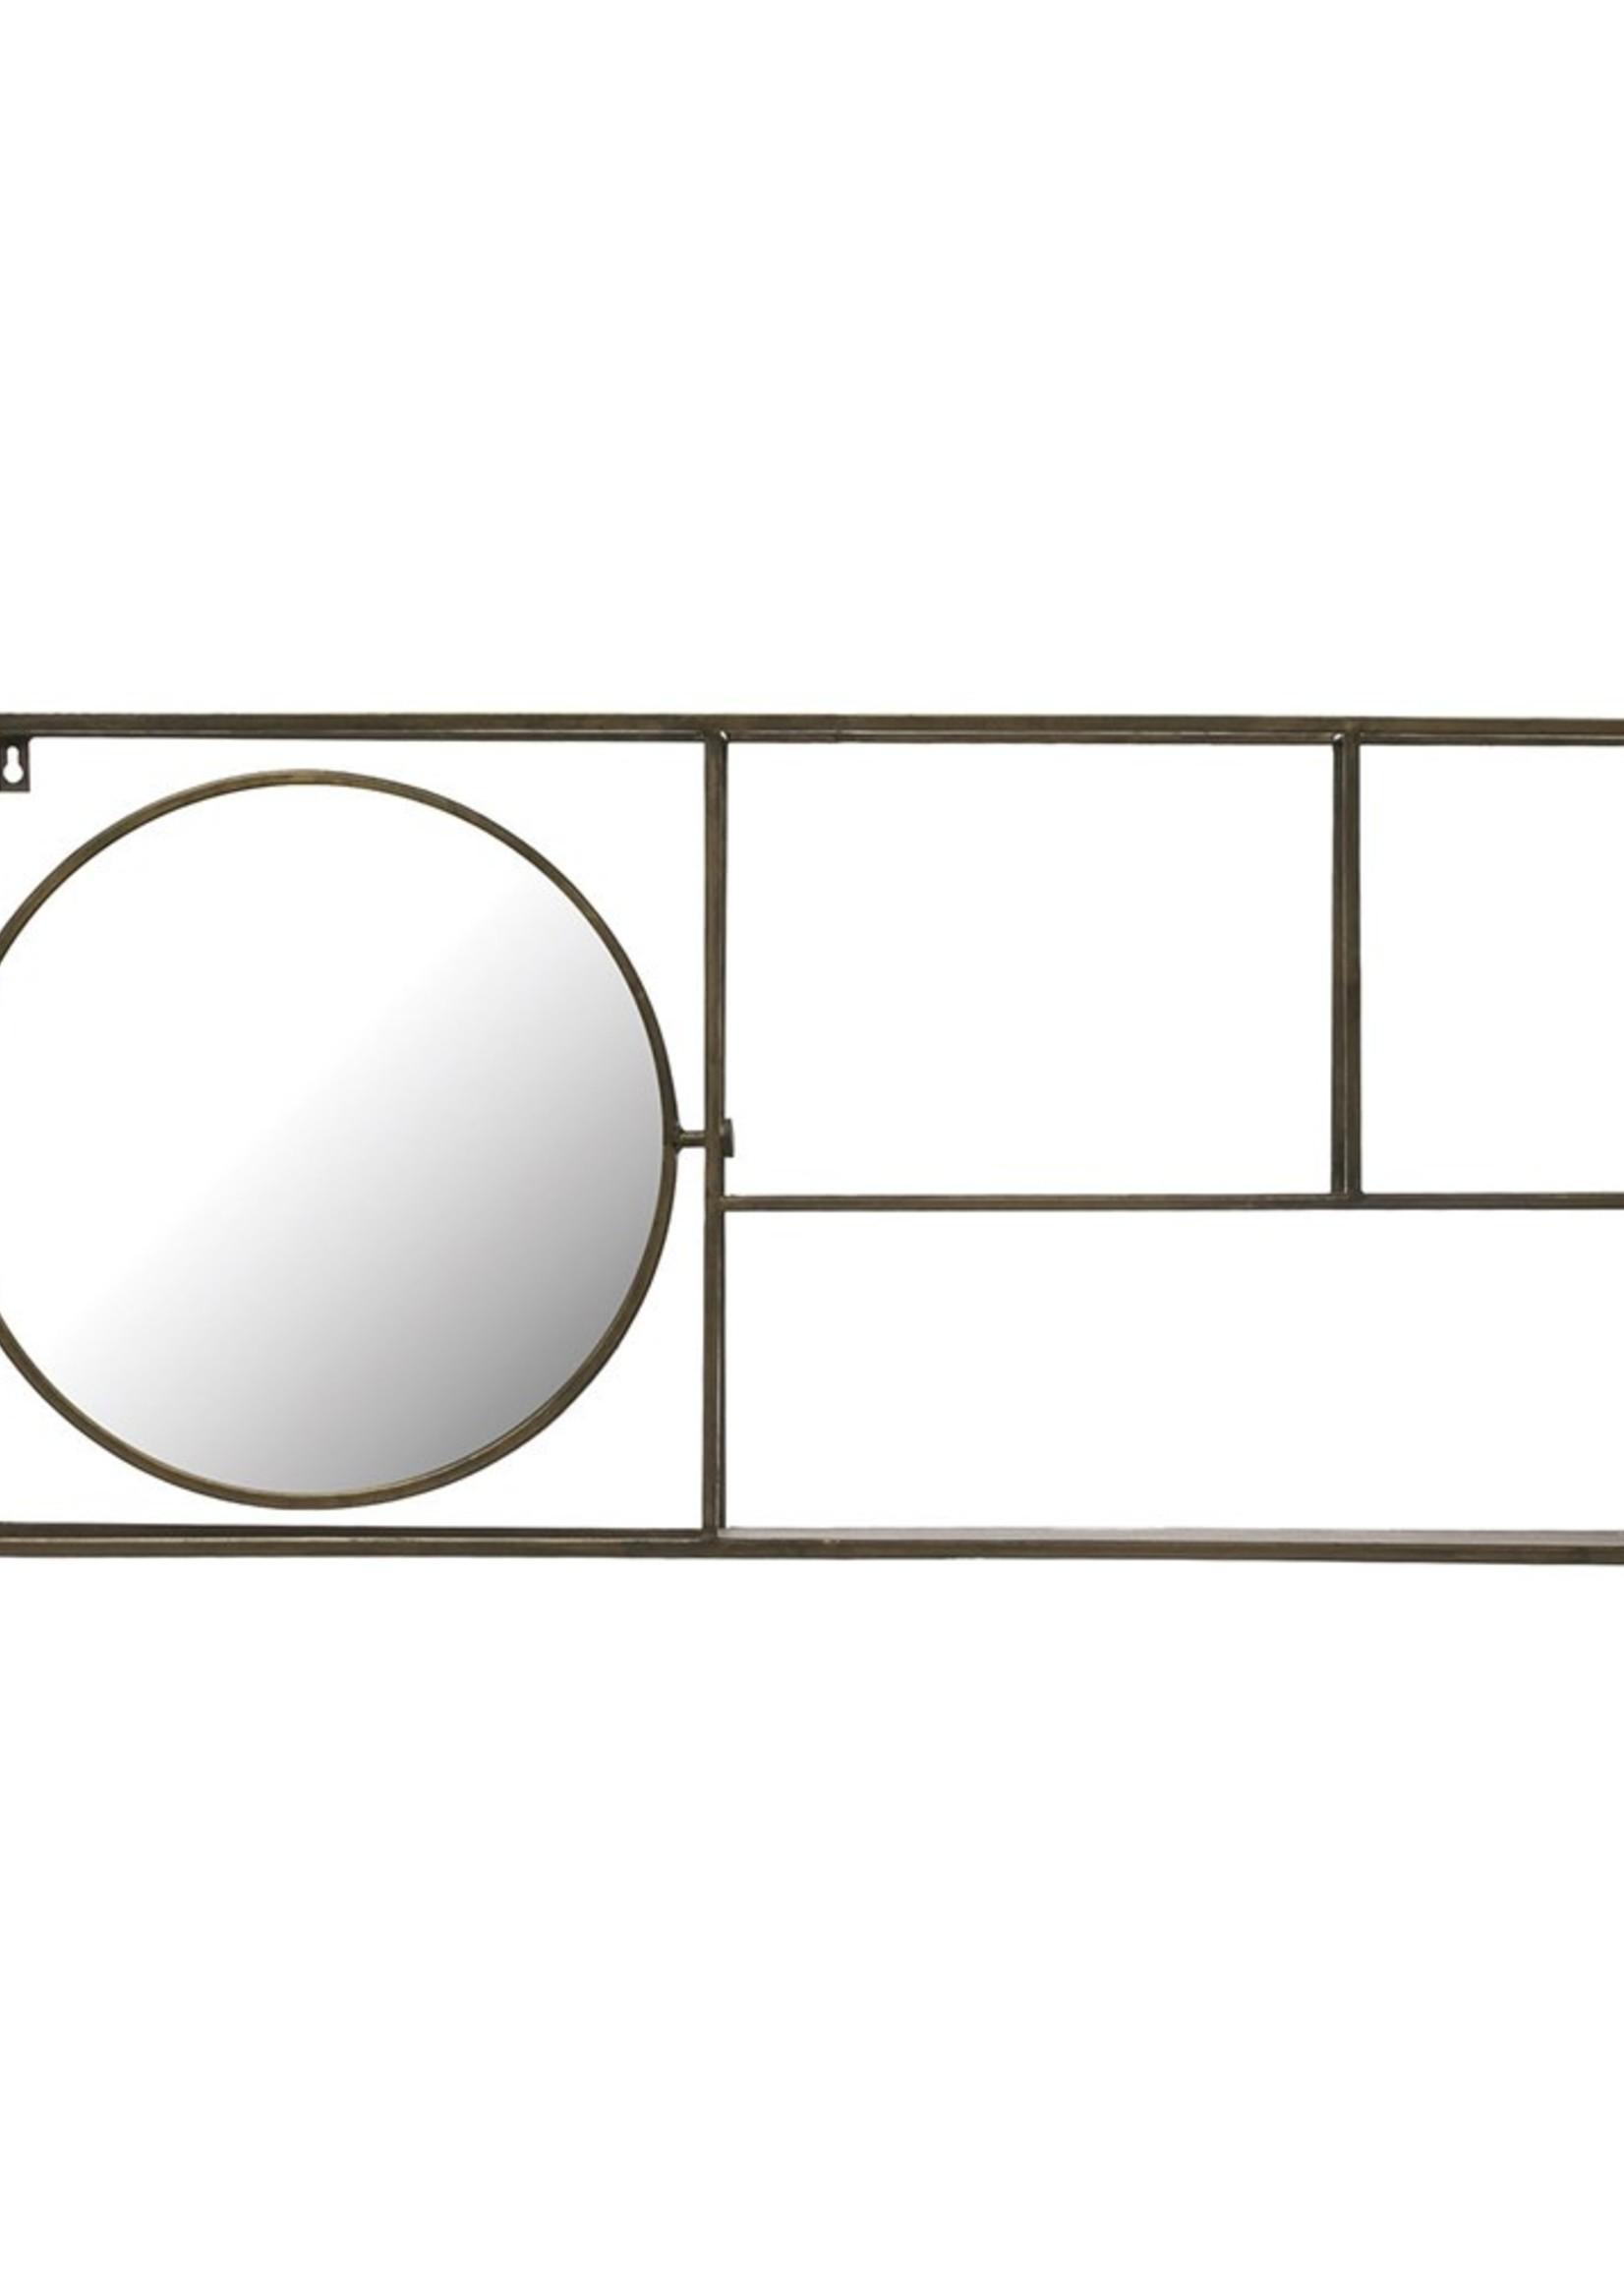 Metal Mirror 2-Tier Wall Shelf, Antique Gold Finish